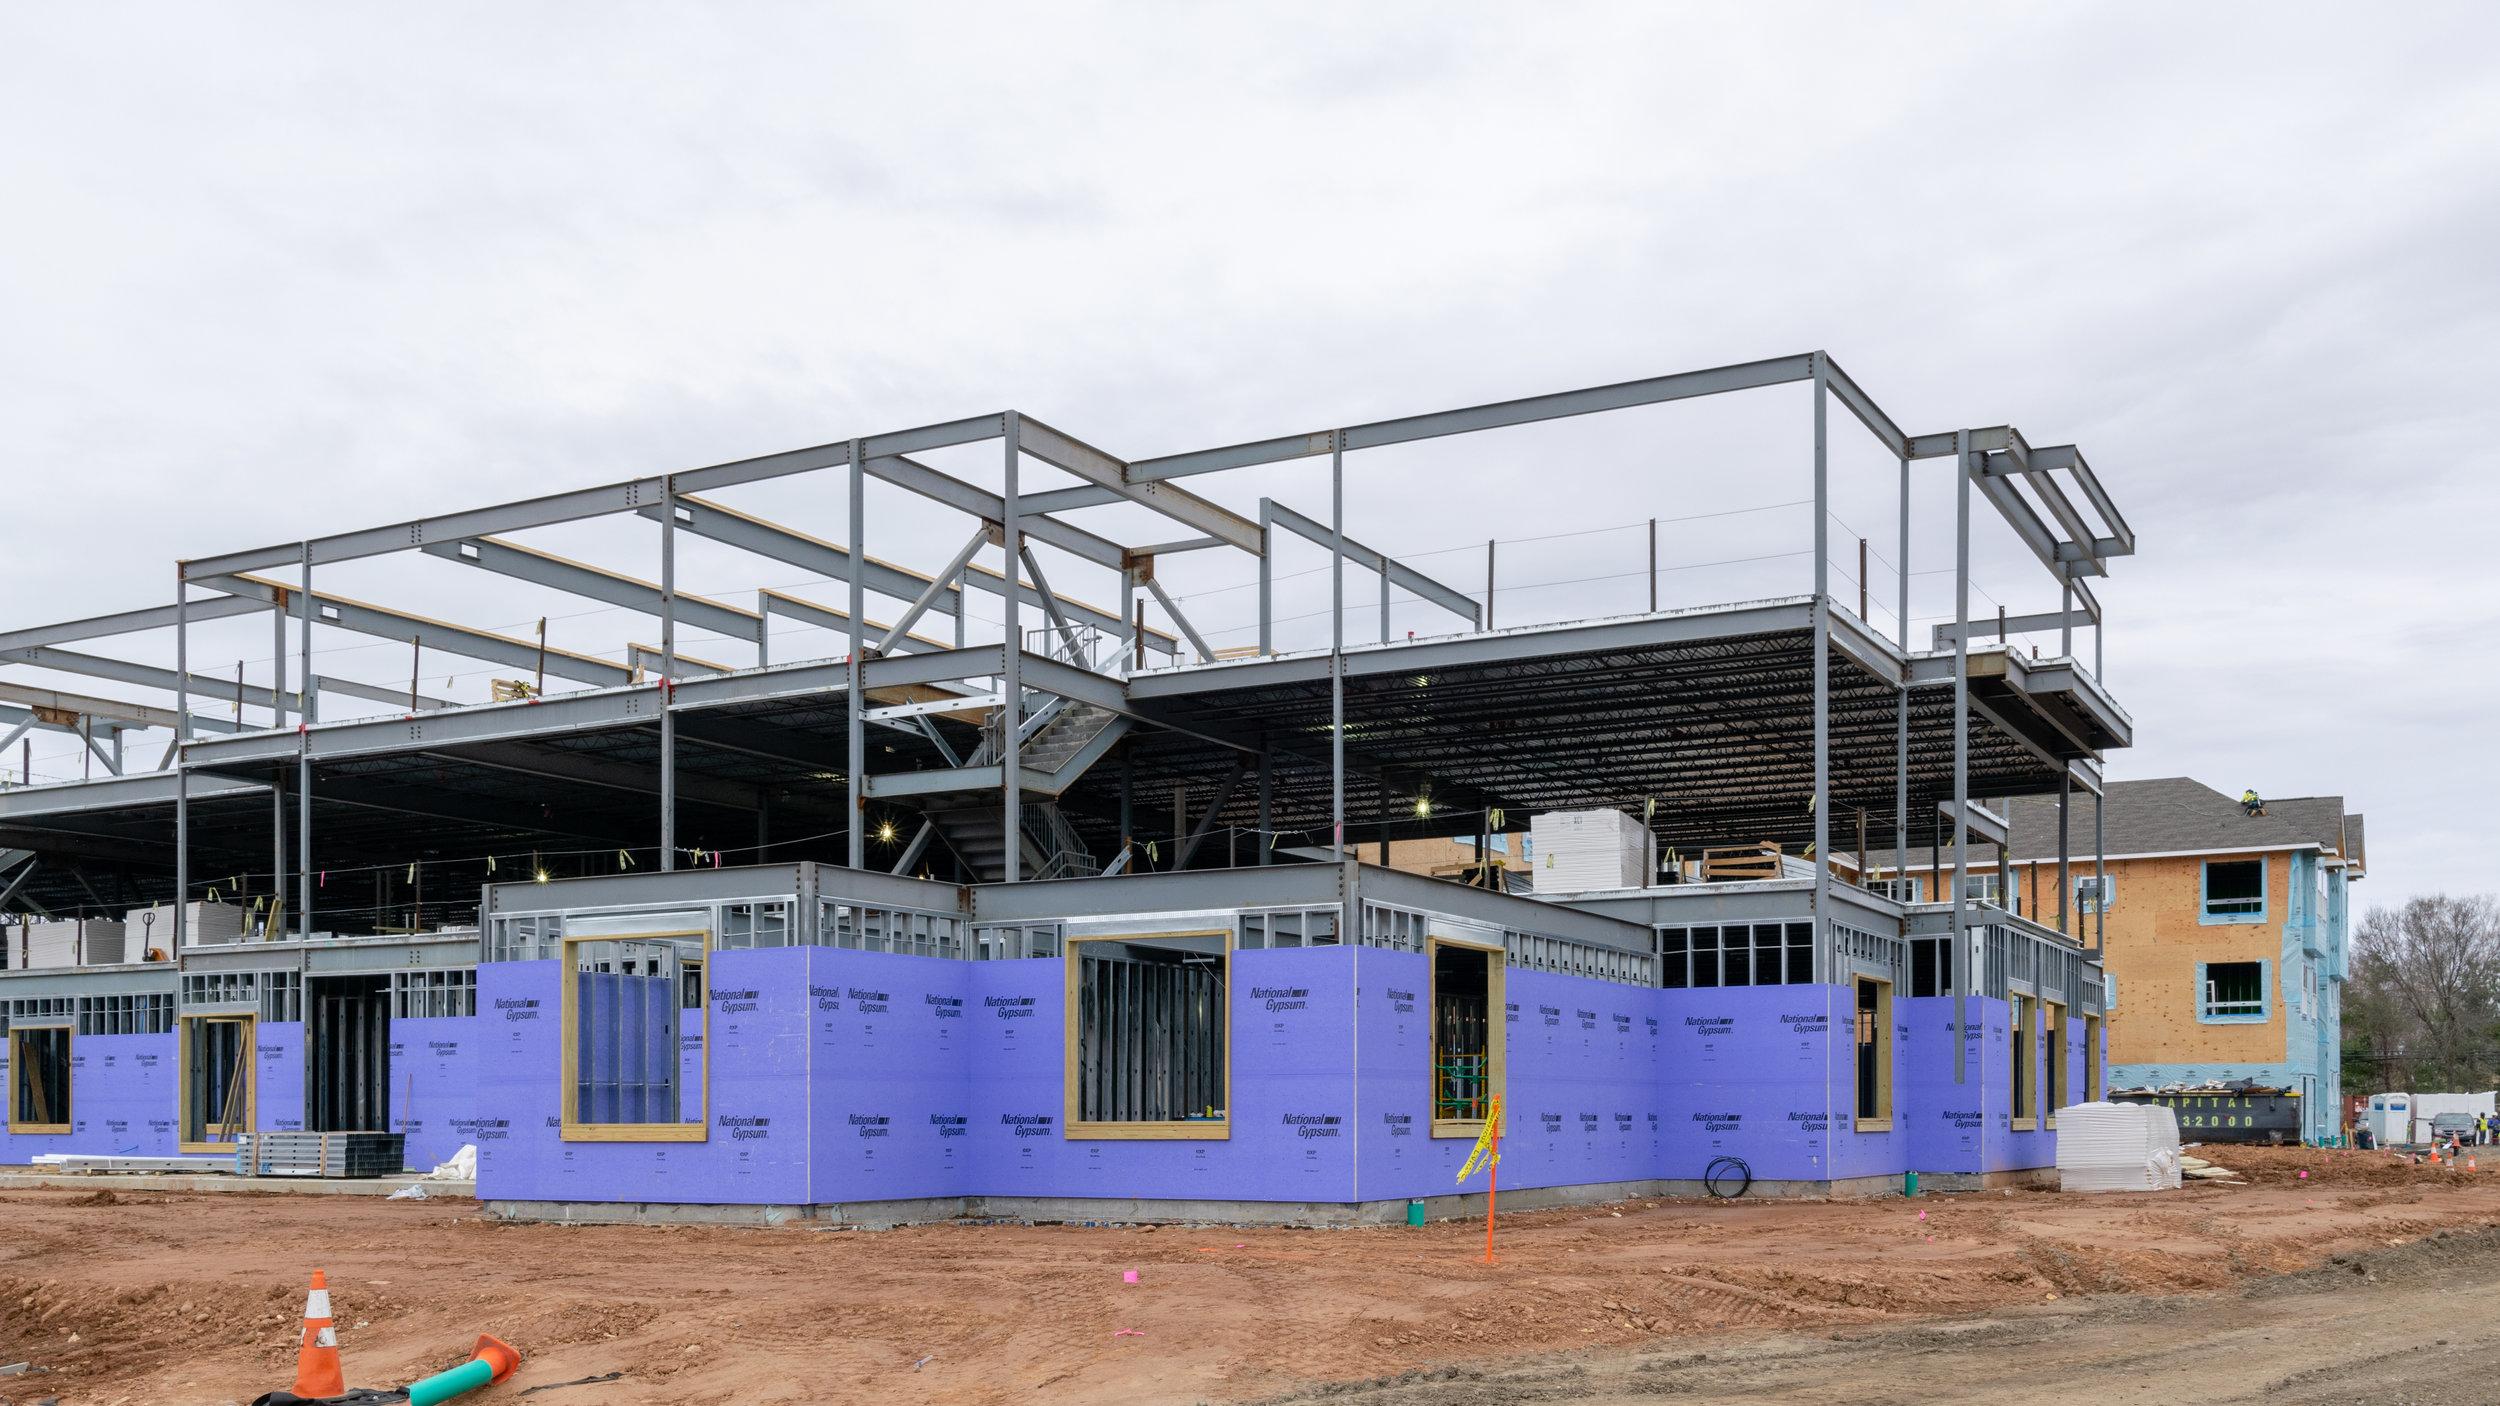 Greenburgh April 2019-52.jpg